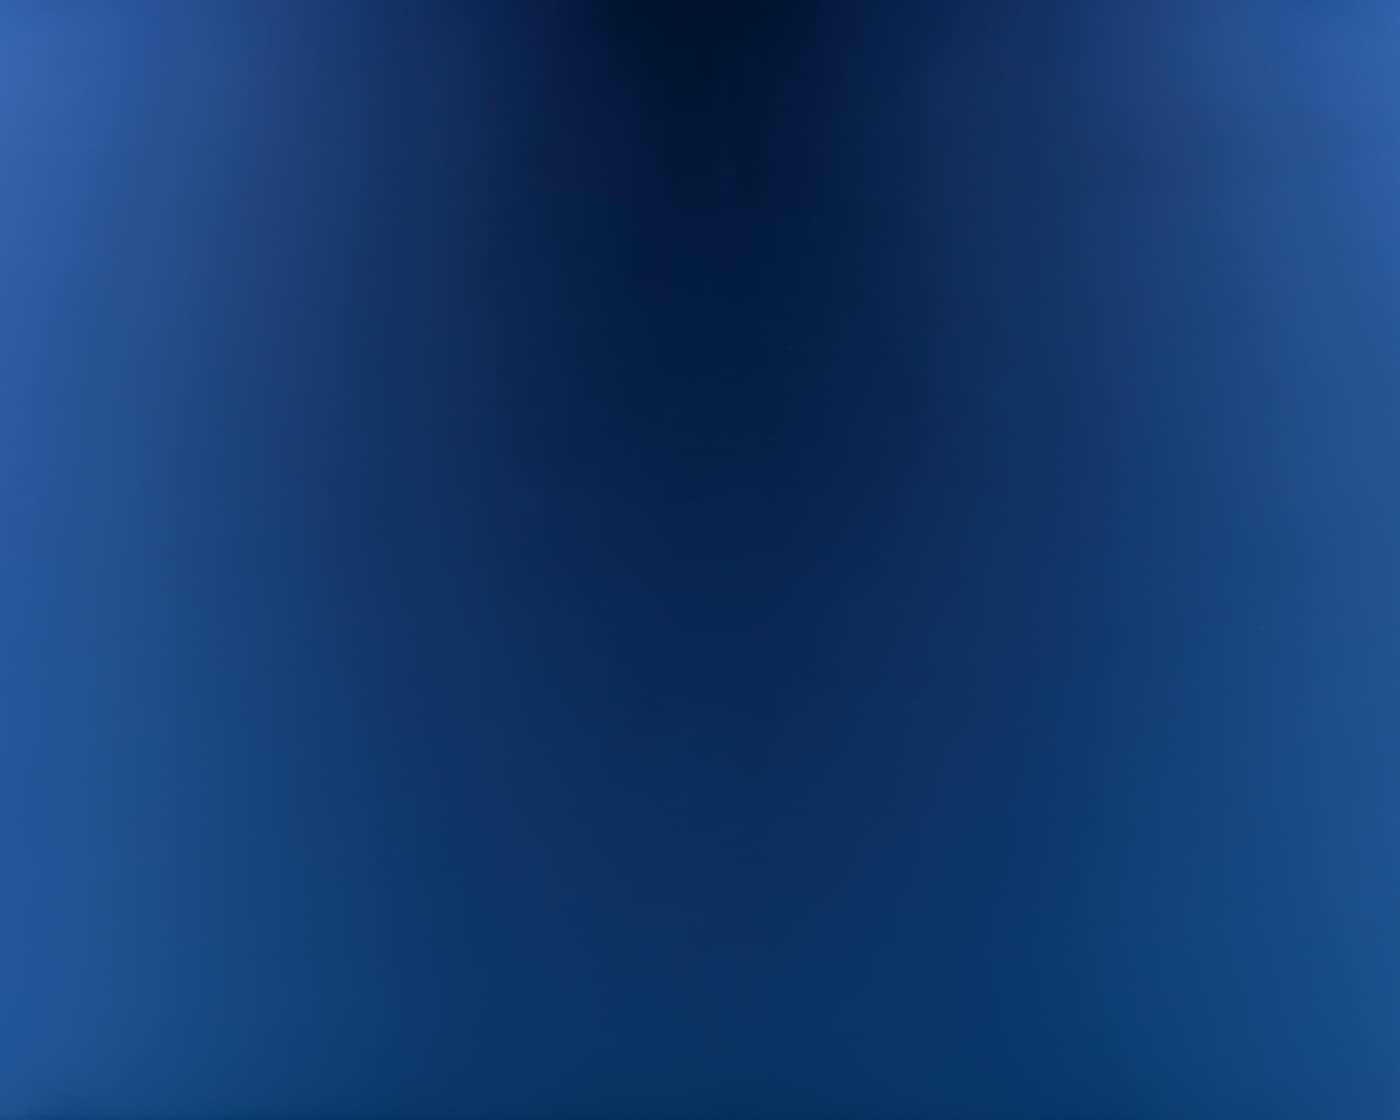 016-aaron-rothman%E2%80%93signal-noise